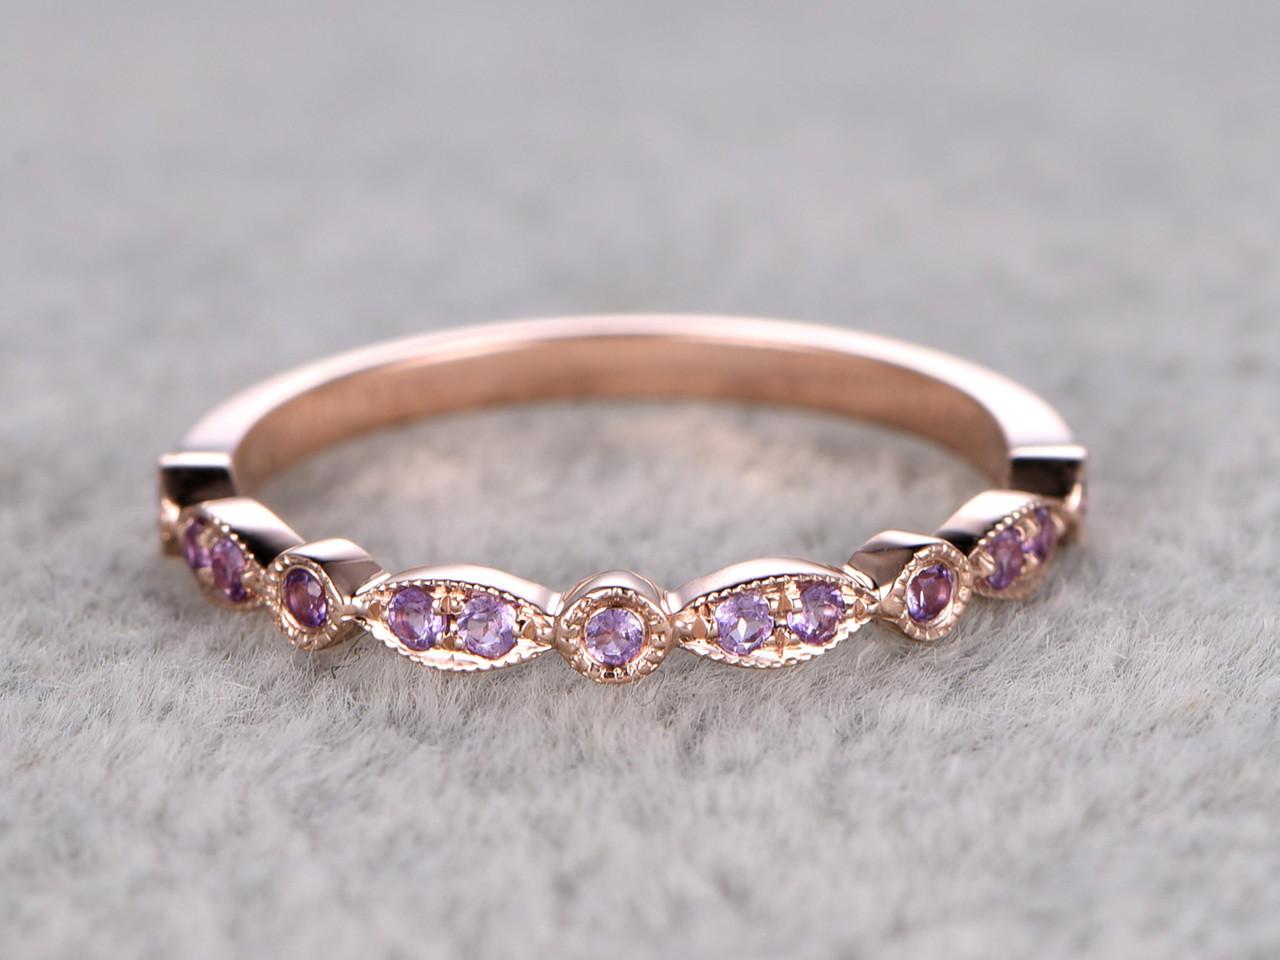 Amethyst Wedding Ring 14k Rose Gold Antique Art Deco Half Eternity